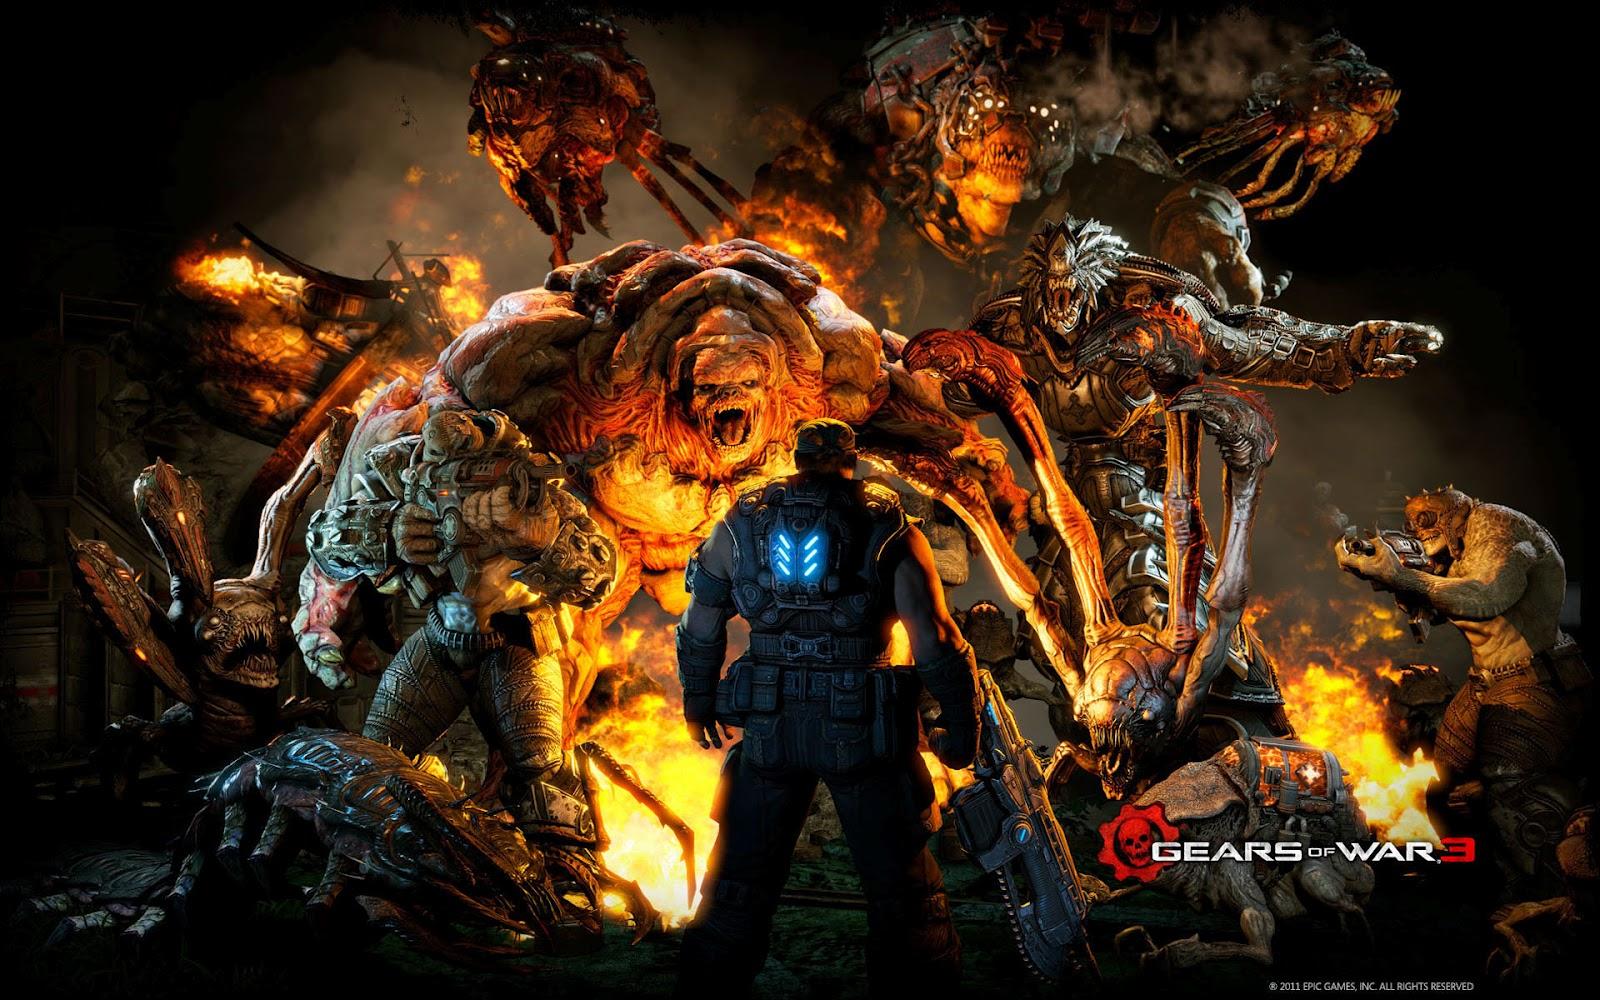 http://2.bp.blogspot.com/-UE-5K2U1JxQ/T75vH4BQfOI/AAAAAAAABfg/nXJcrKbI2Bk/s1600/gears_of_war_3_mission-wide.jpg